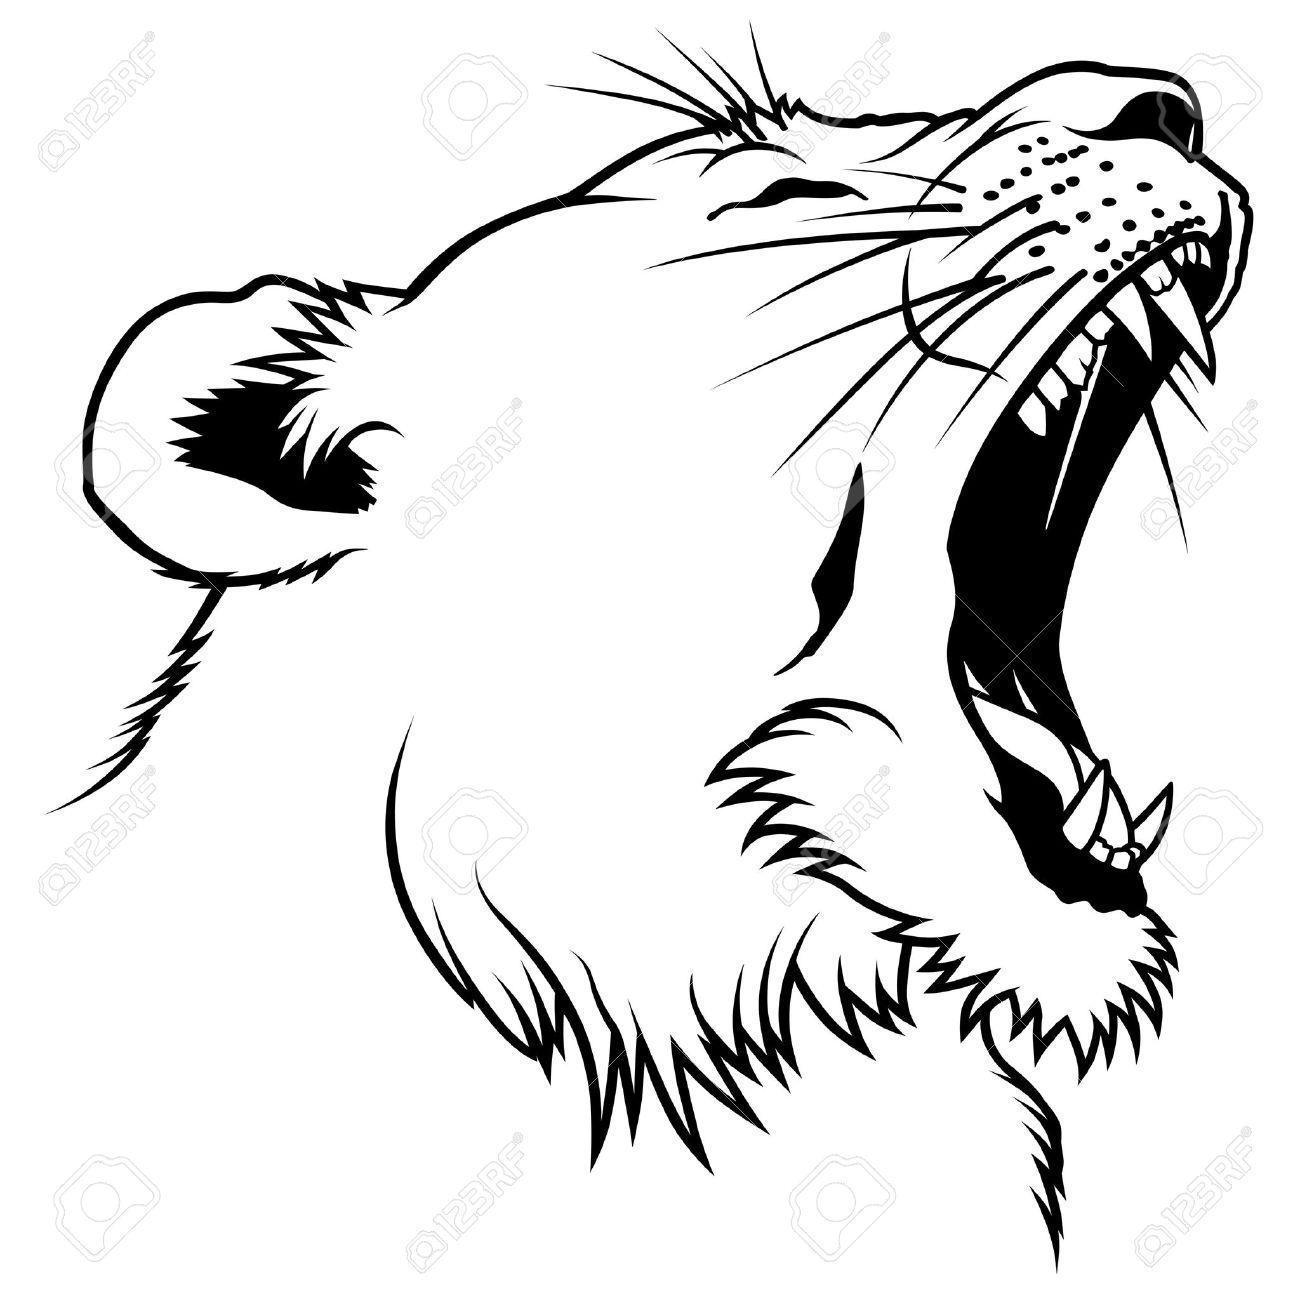 hight resolution of lioness head hand drawn illustration stock vector 6561512